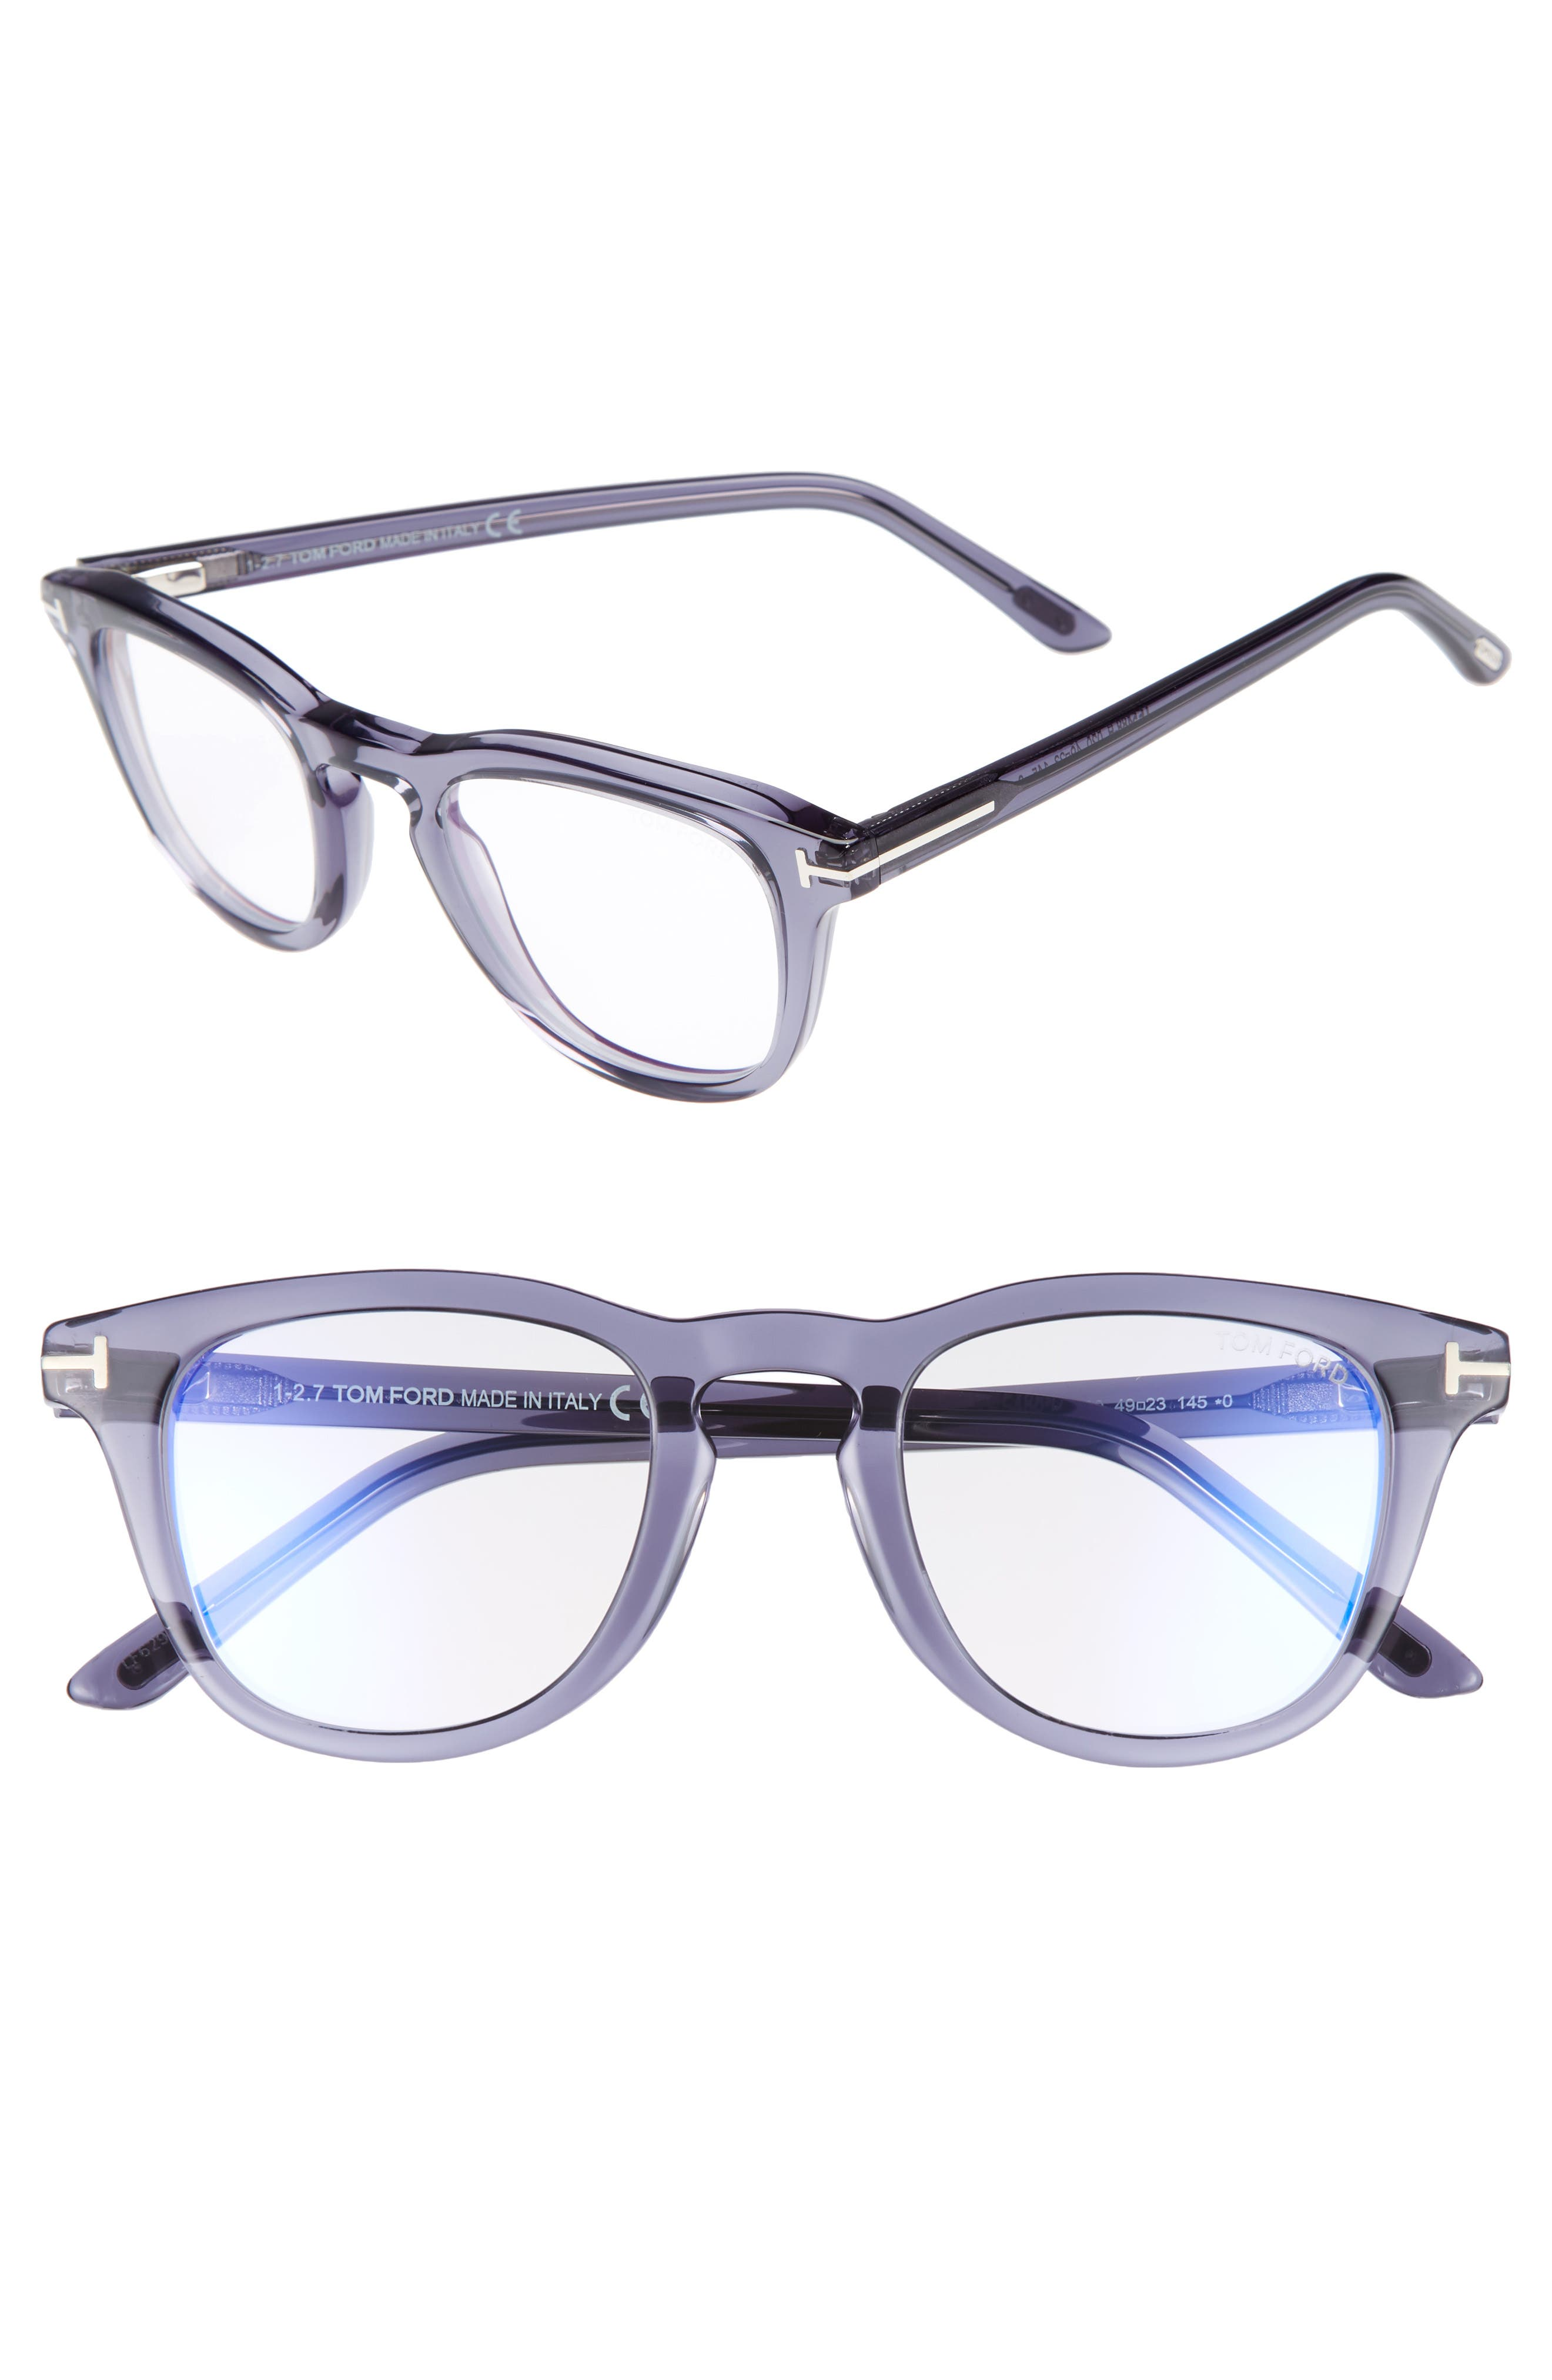 8da252b85a1f Tom Ford Blue Block Semitransparent Acetate Square Optical Frames In Shiny  Transparent Grey  Blue